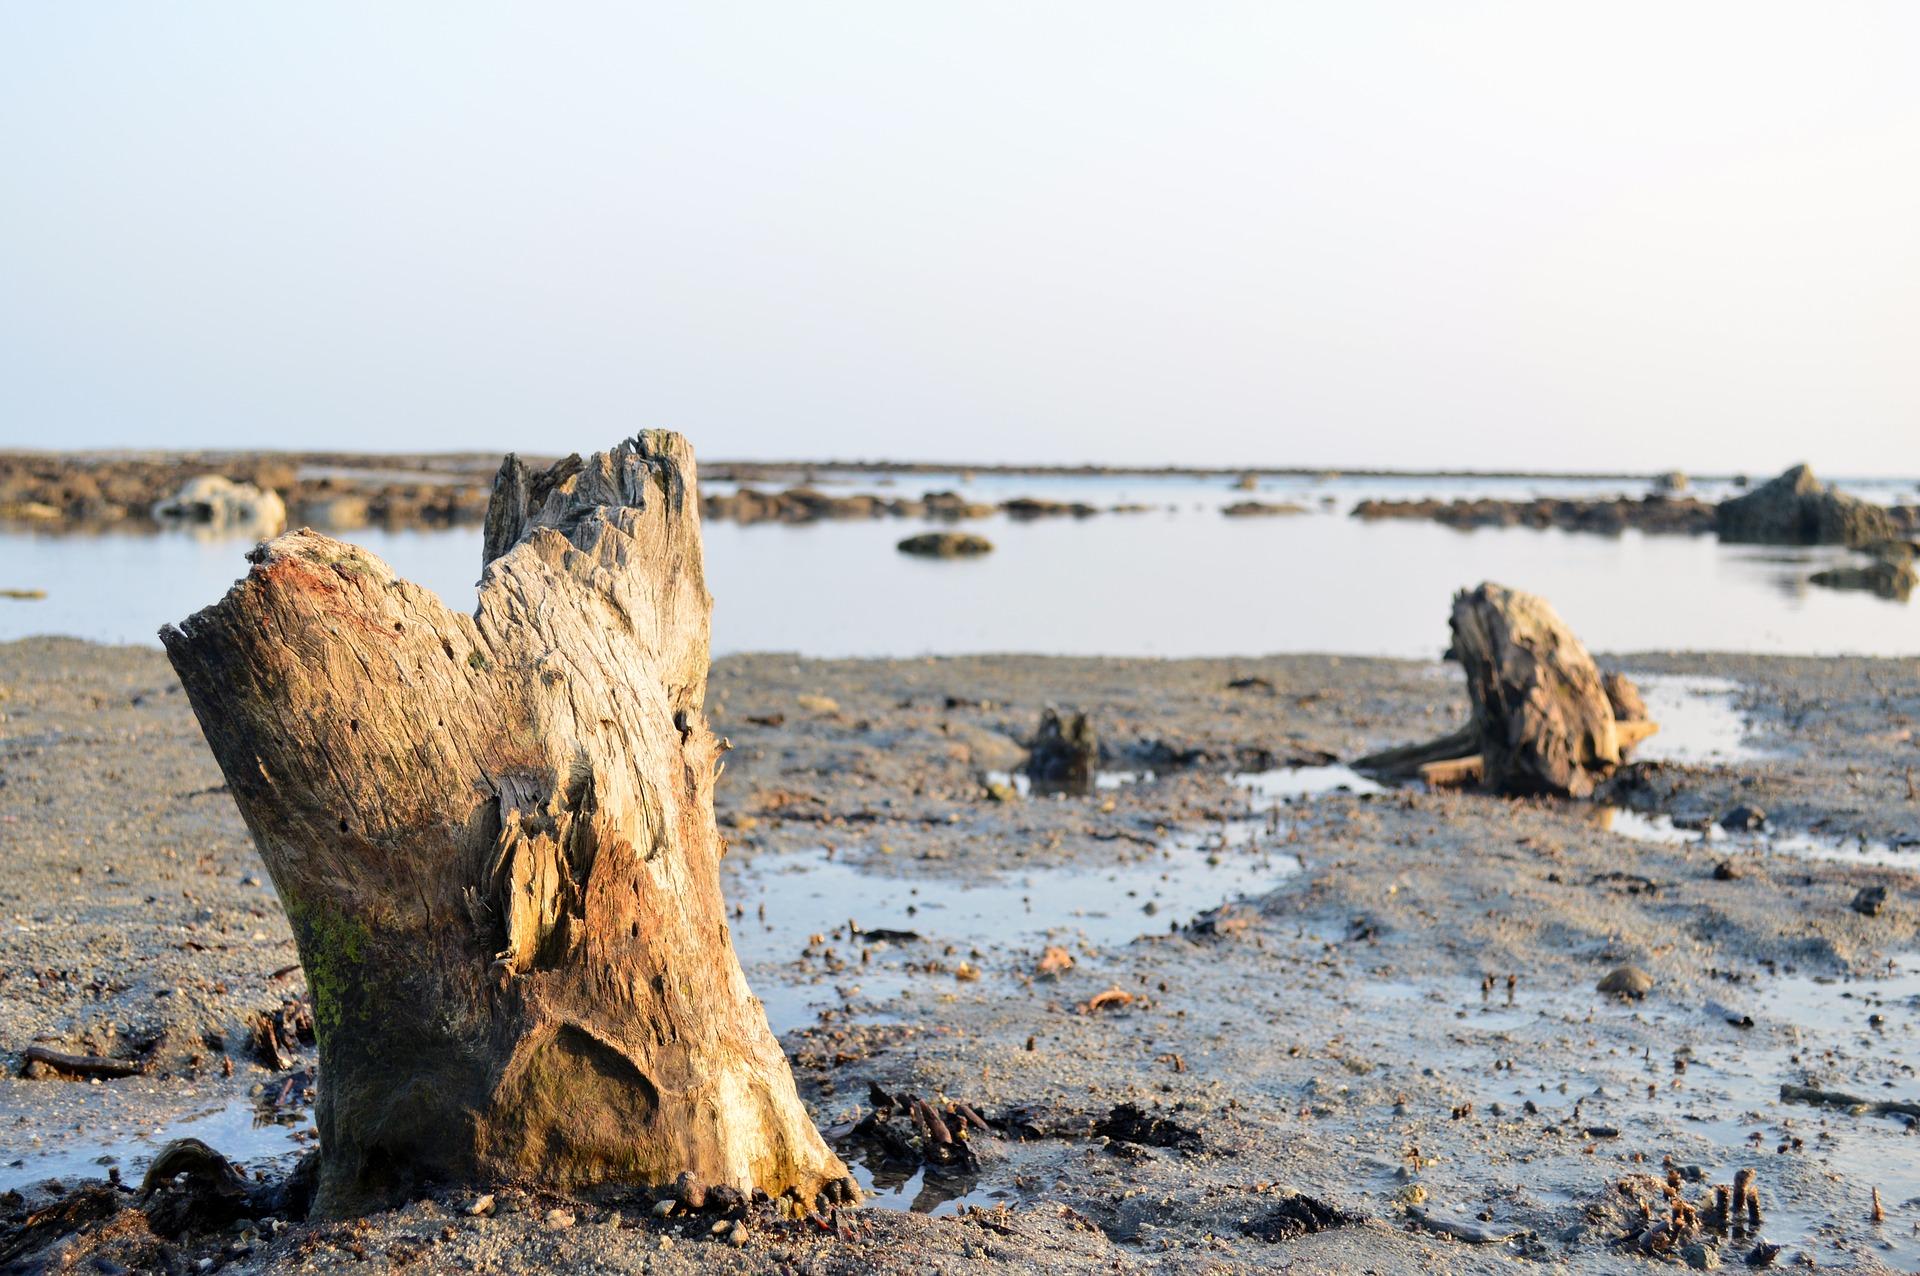 Uprooted trees on a Sint Maarten (Saint Martin0 beach.